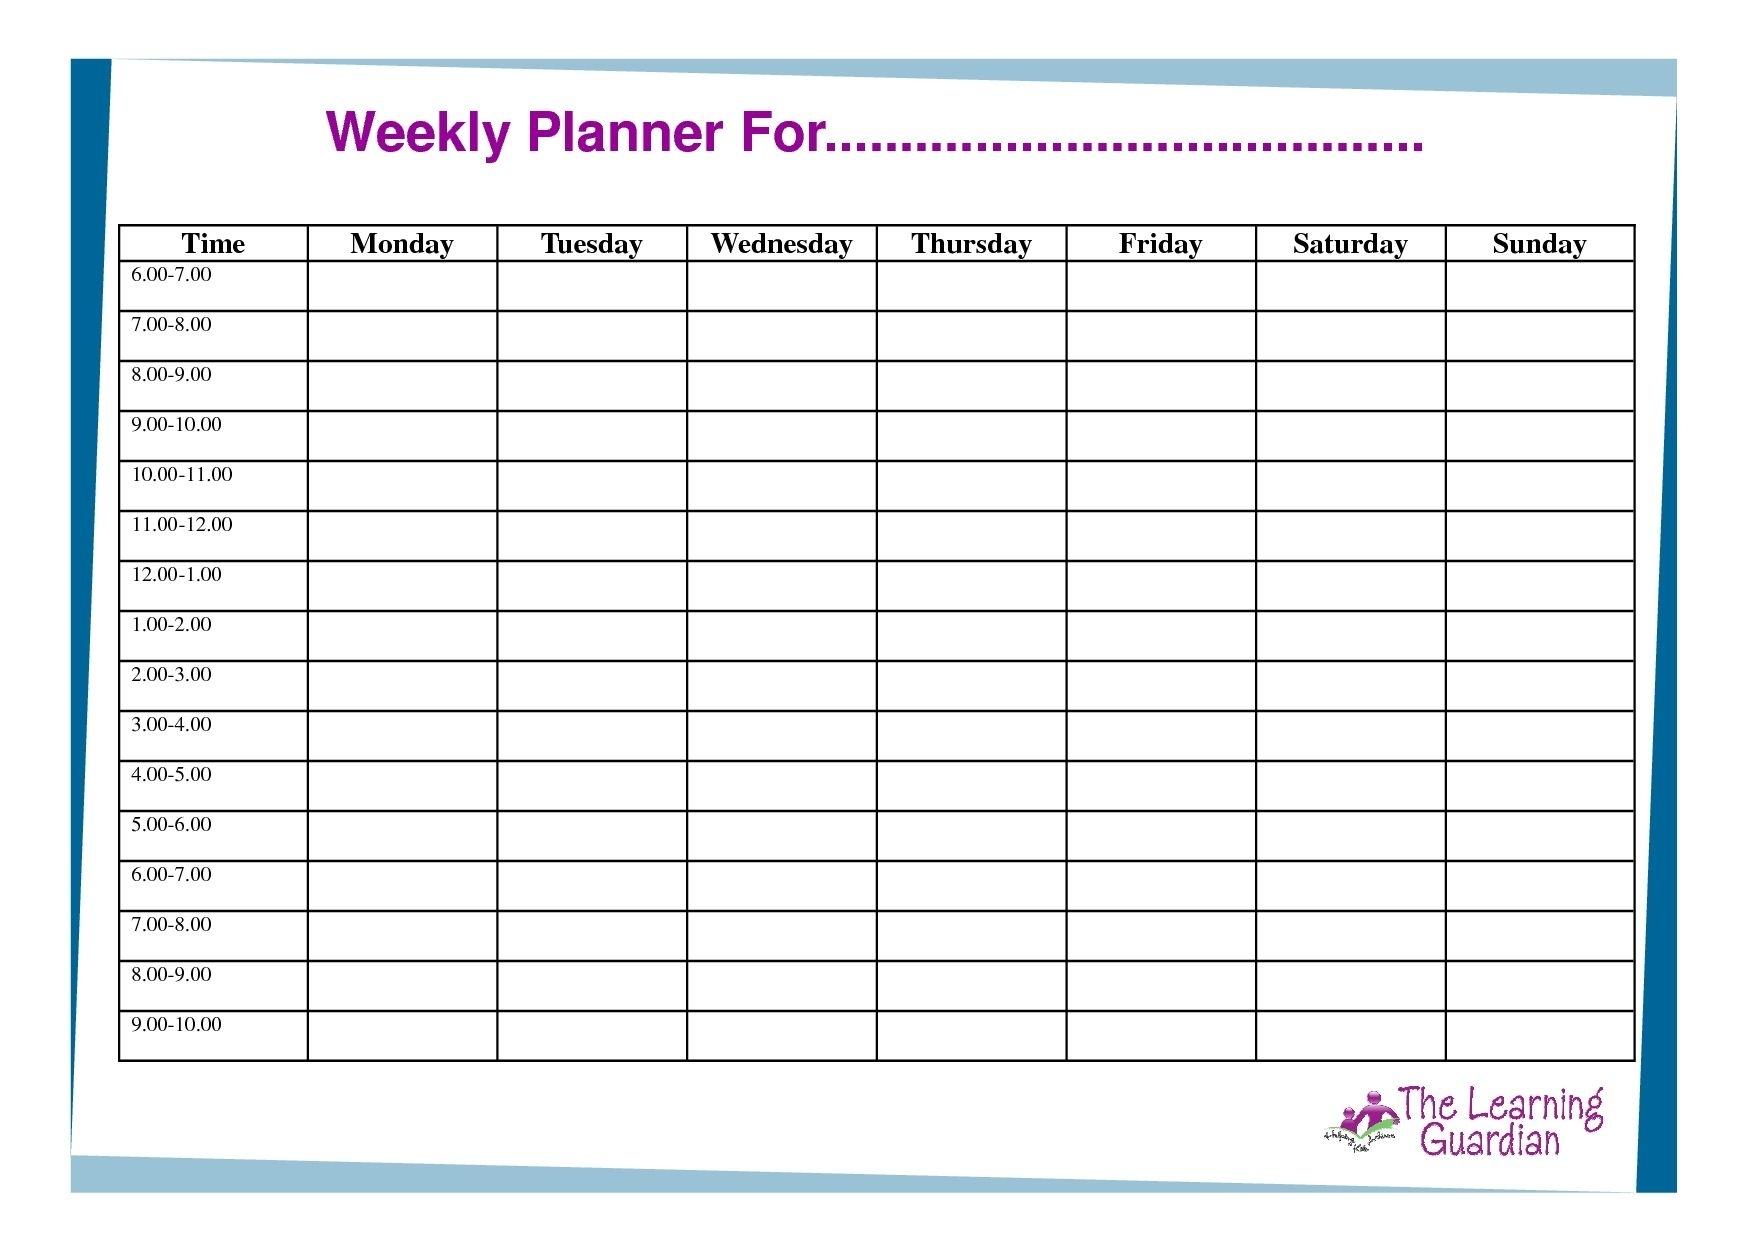 Free Printable Weekly Calendar Templates Weekly Planner For Time for Calendar Day Planner Templates Free